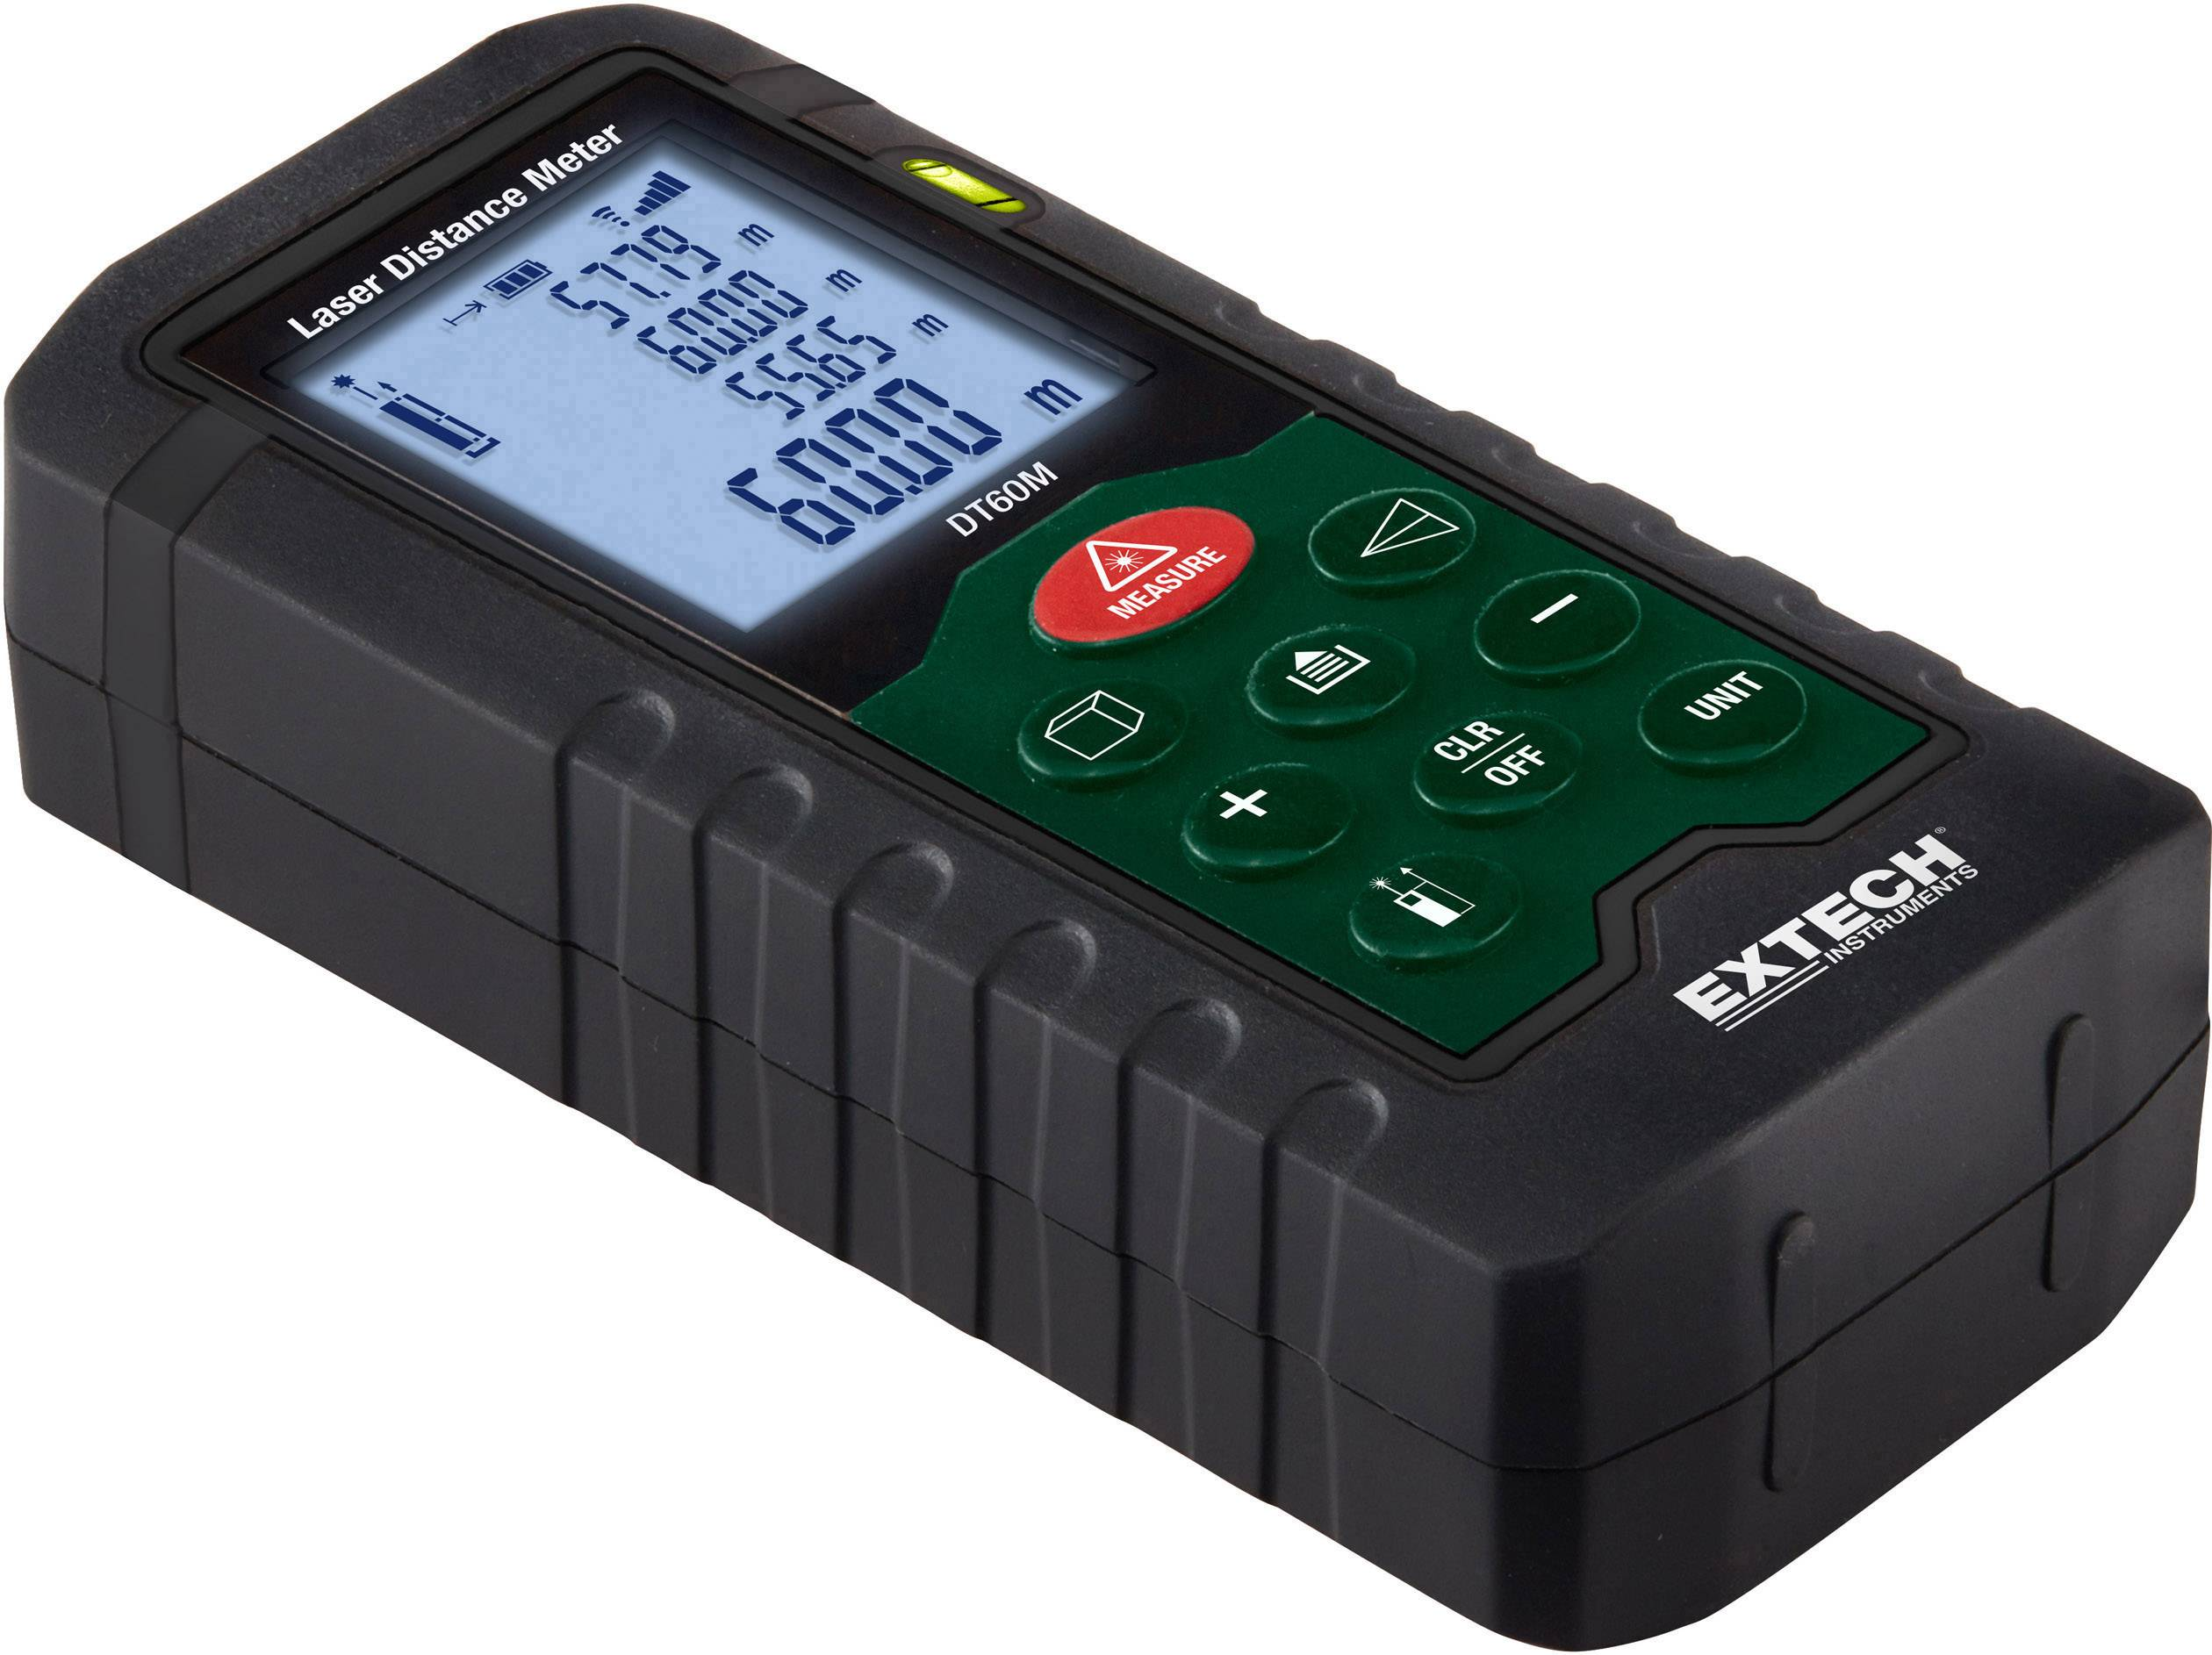 Ultraschall Entfernungsmesser Genauigkeit : Extech dt m laser entfernungsmesser messbereich max